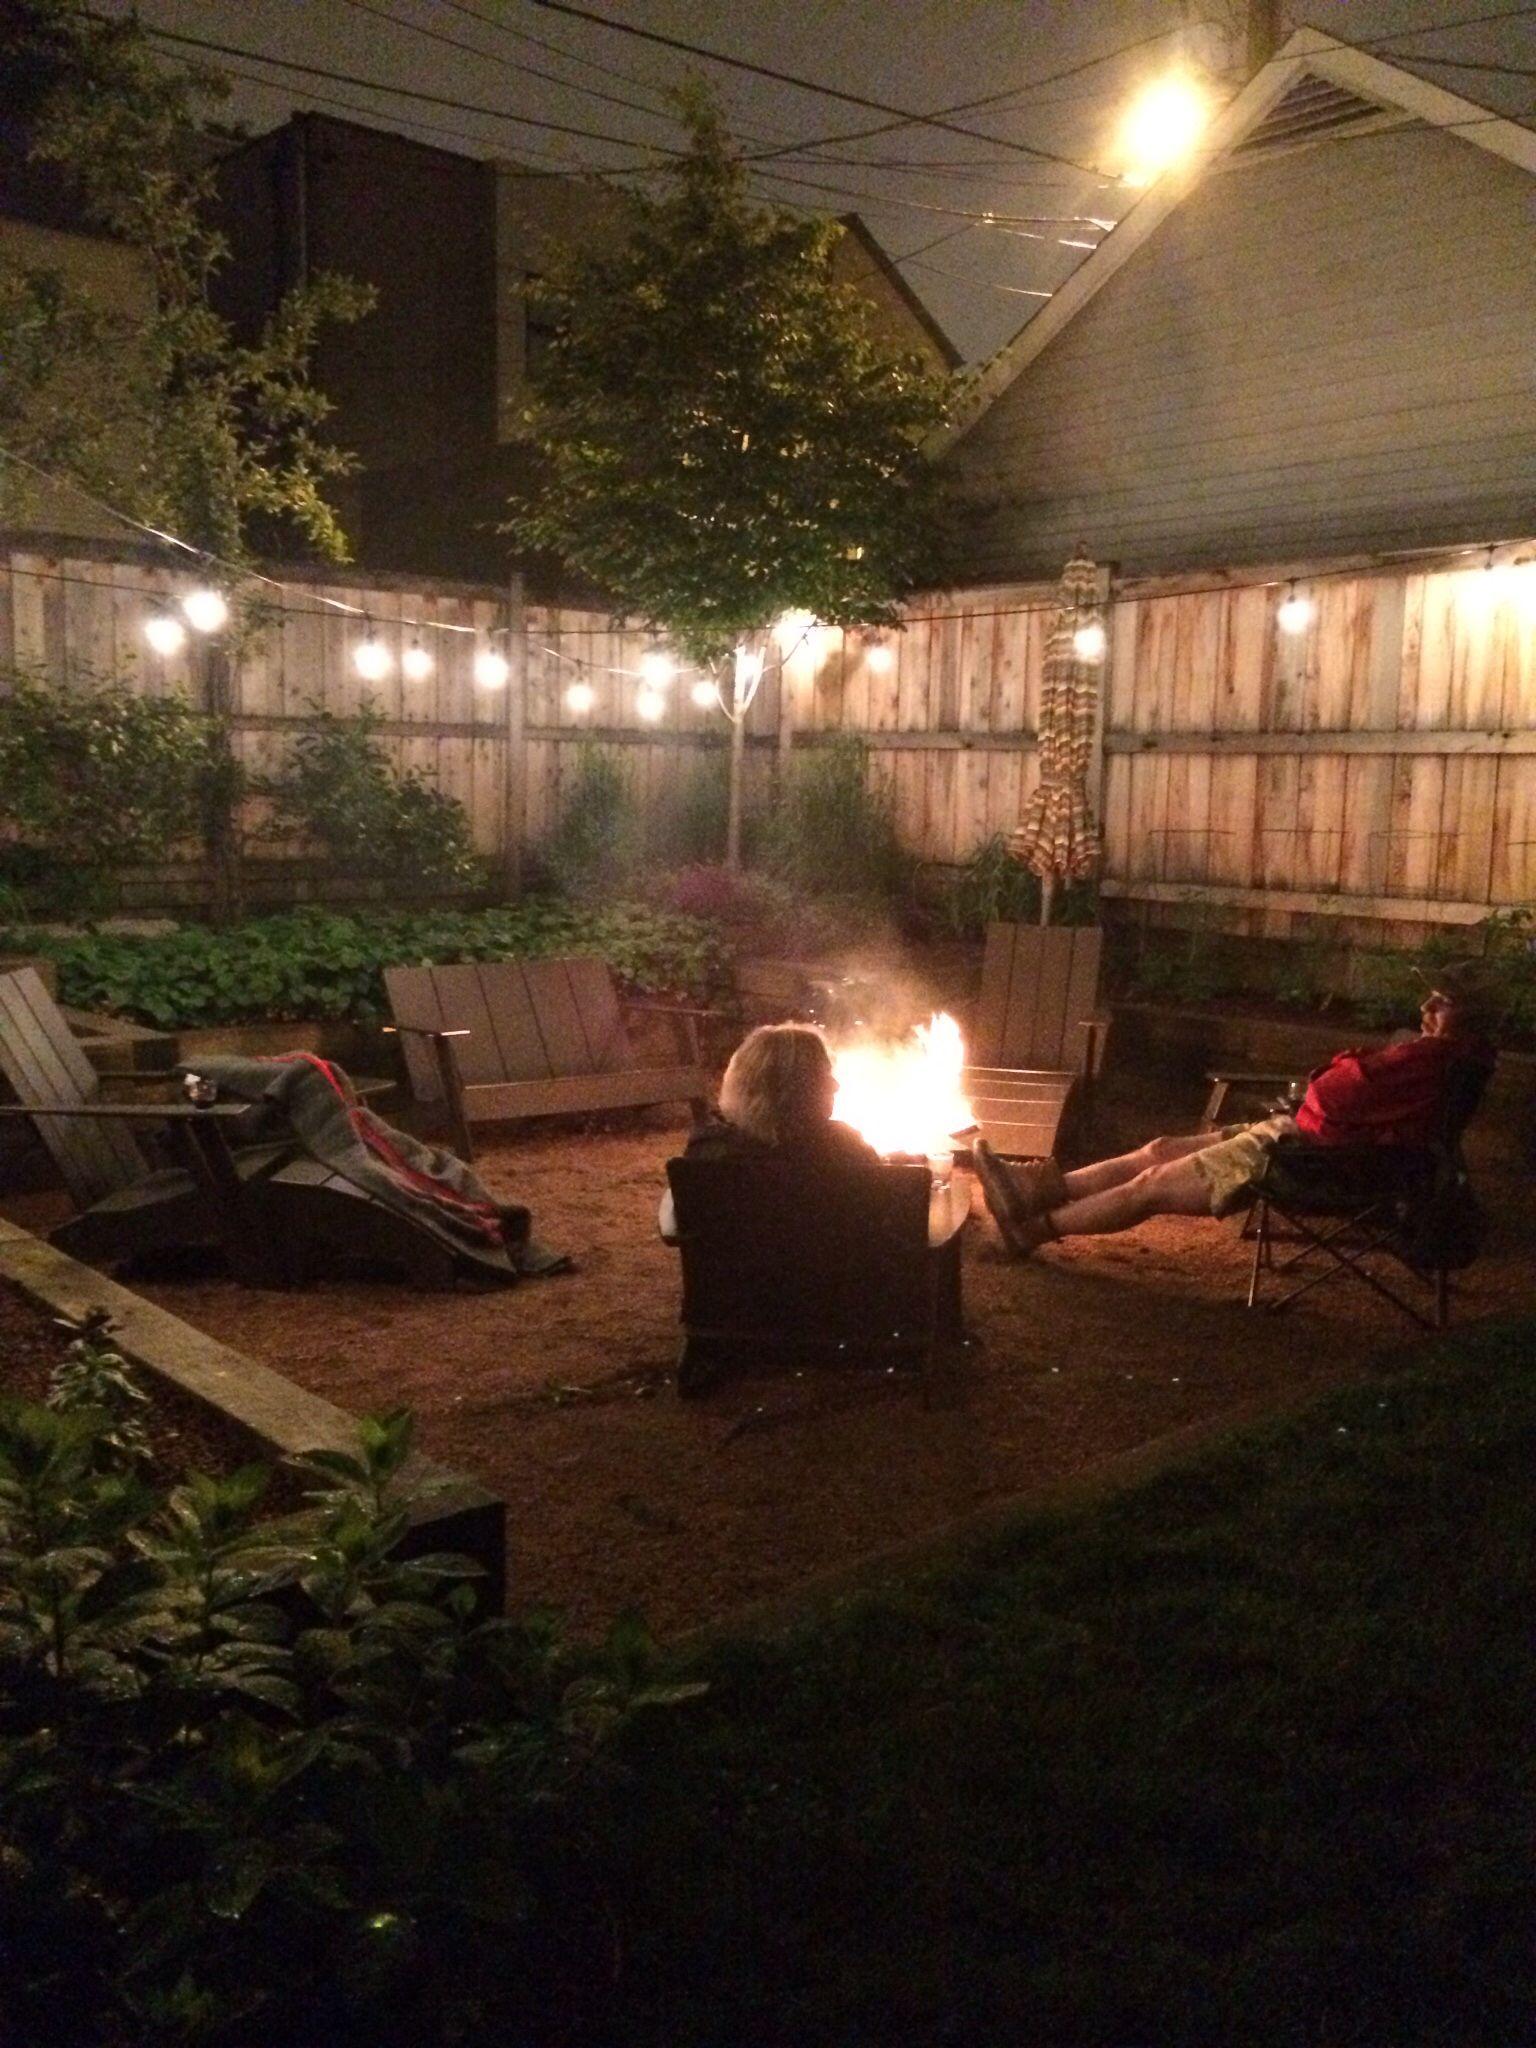 chilly summer night in chicago garden lights loll furniture